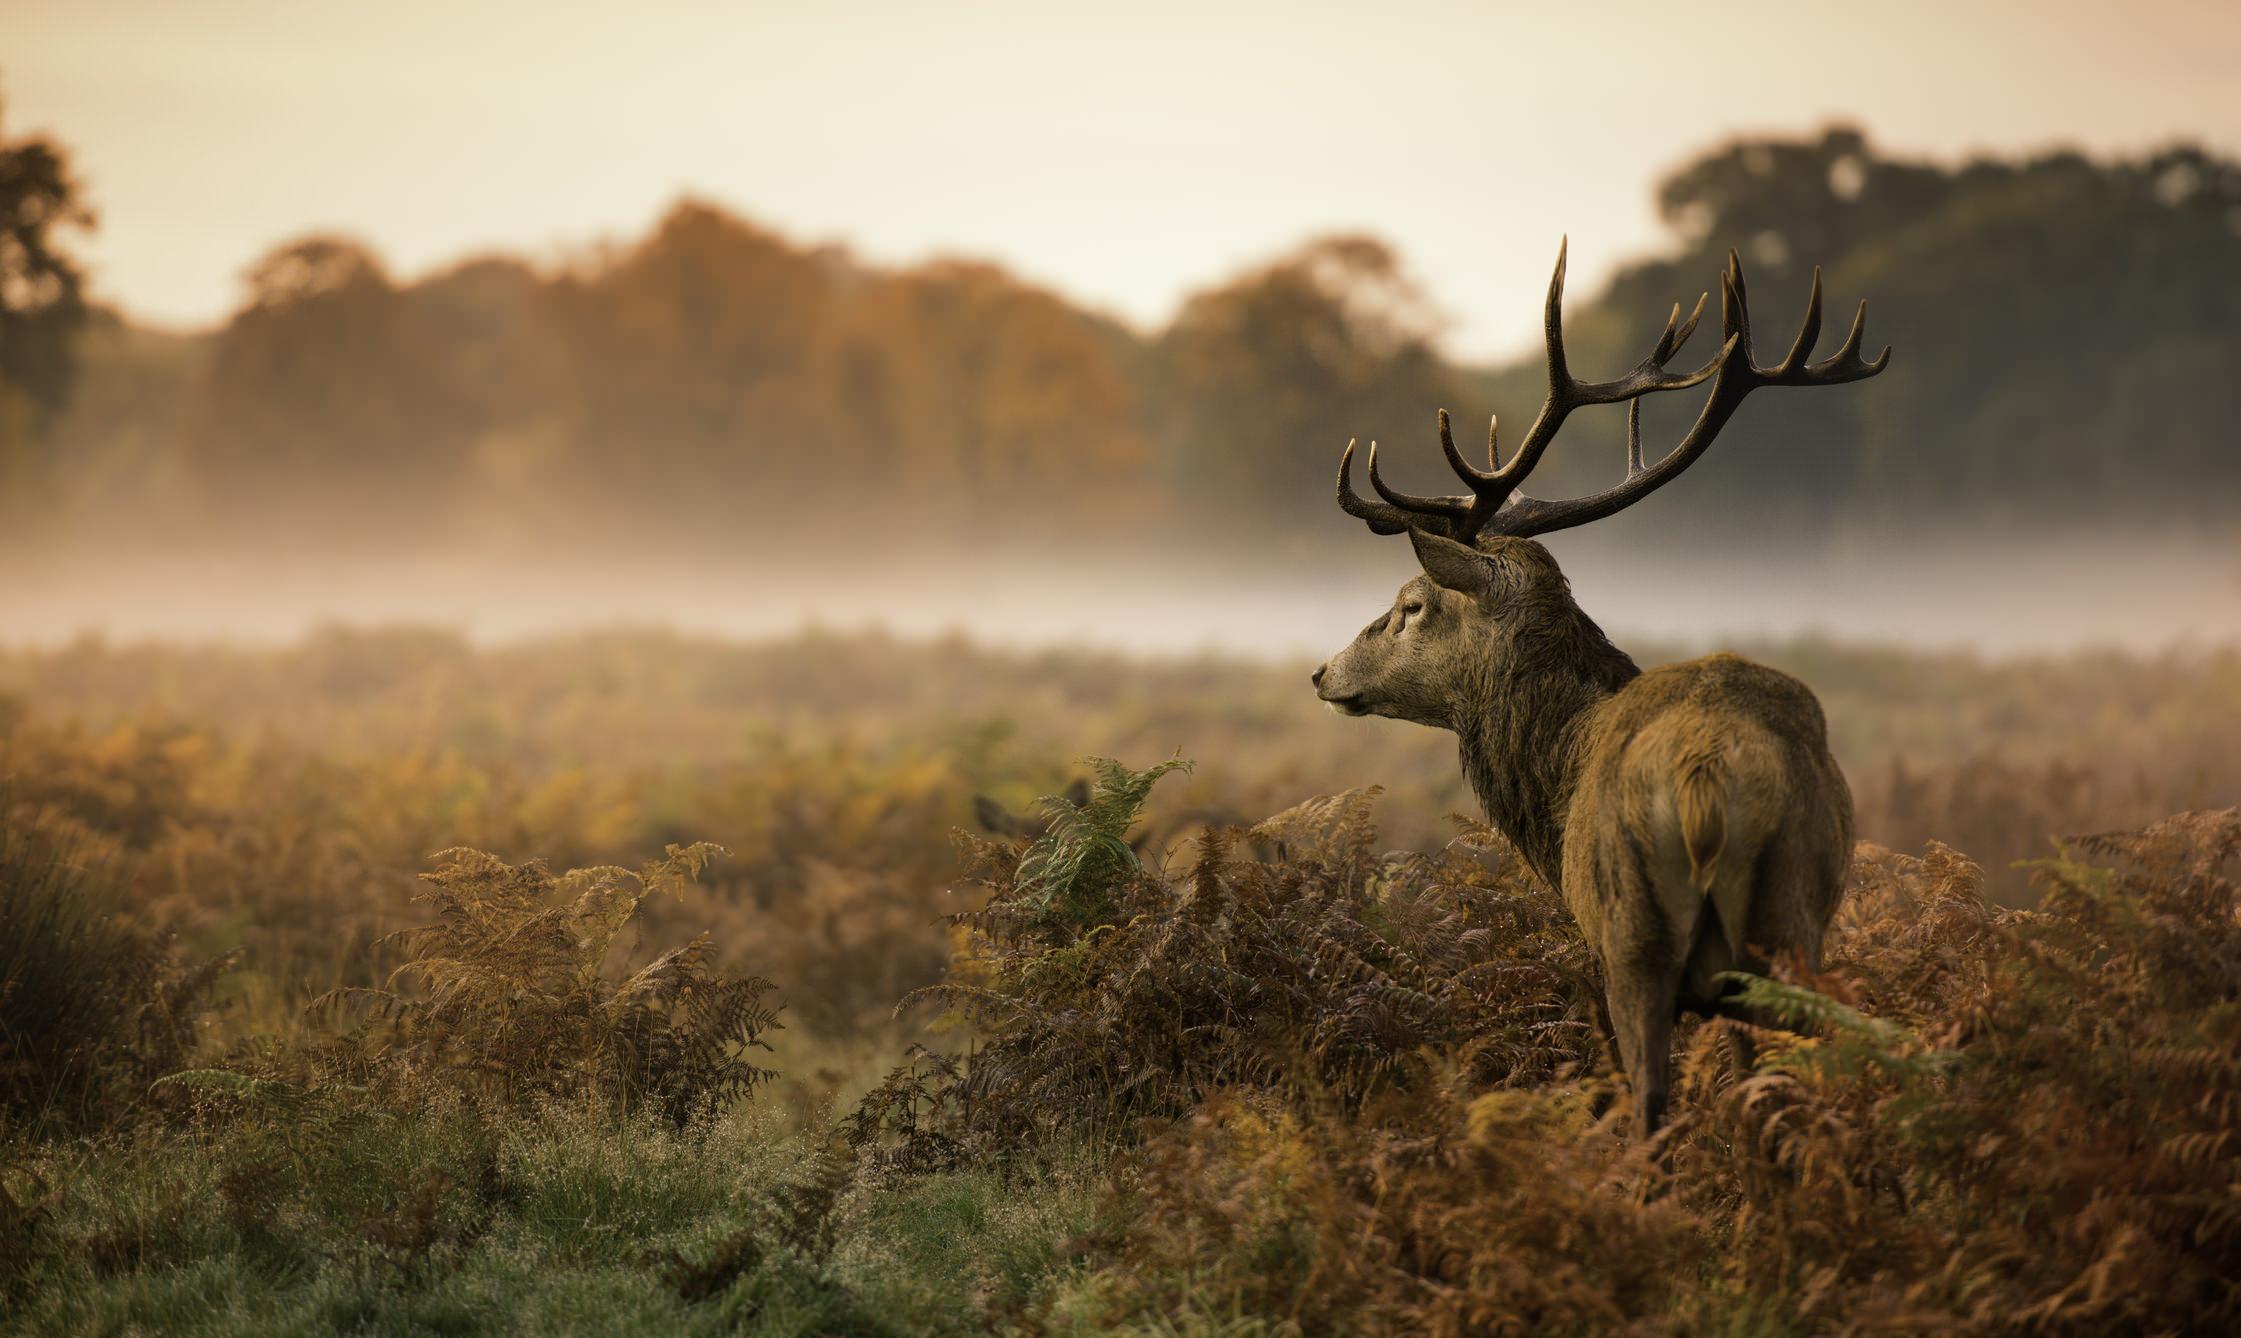 Beginner Wildlife Photography Tip: Basic Camera Settings